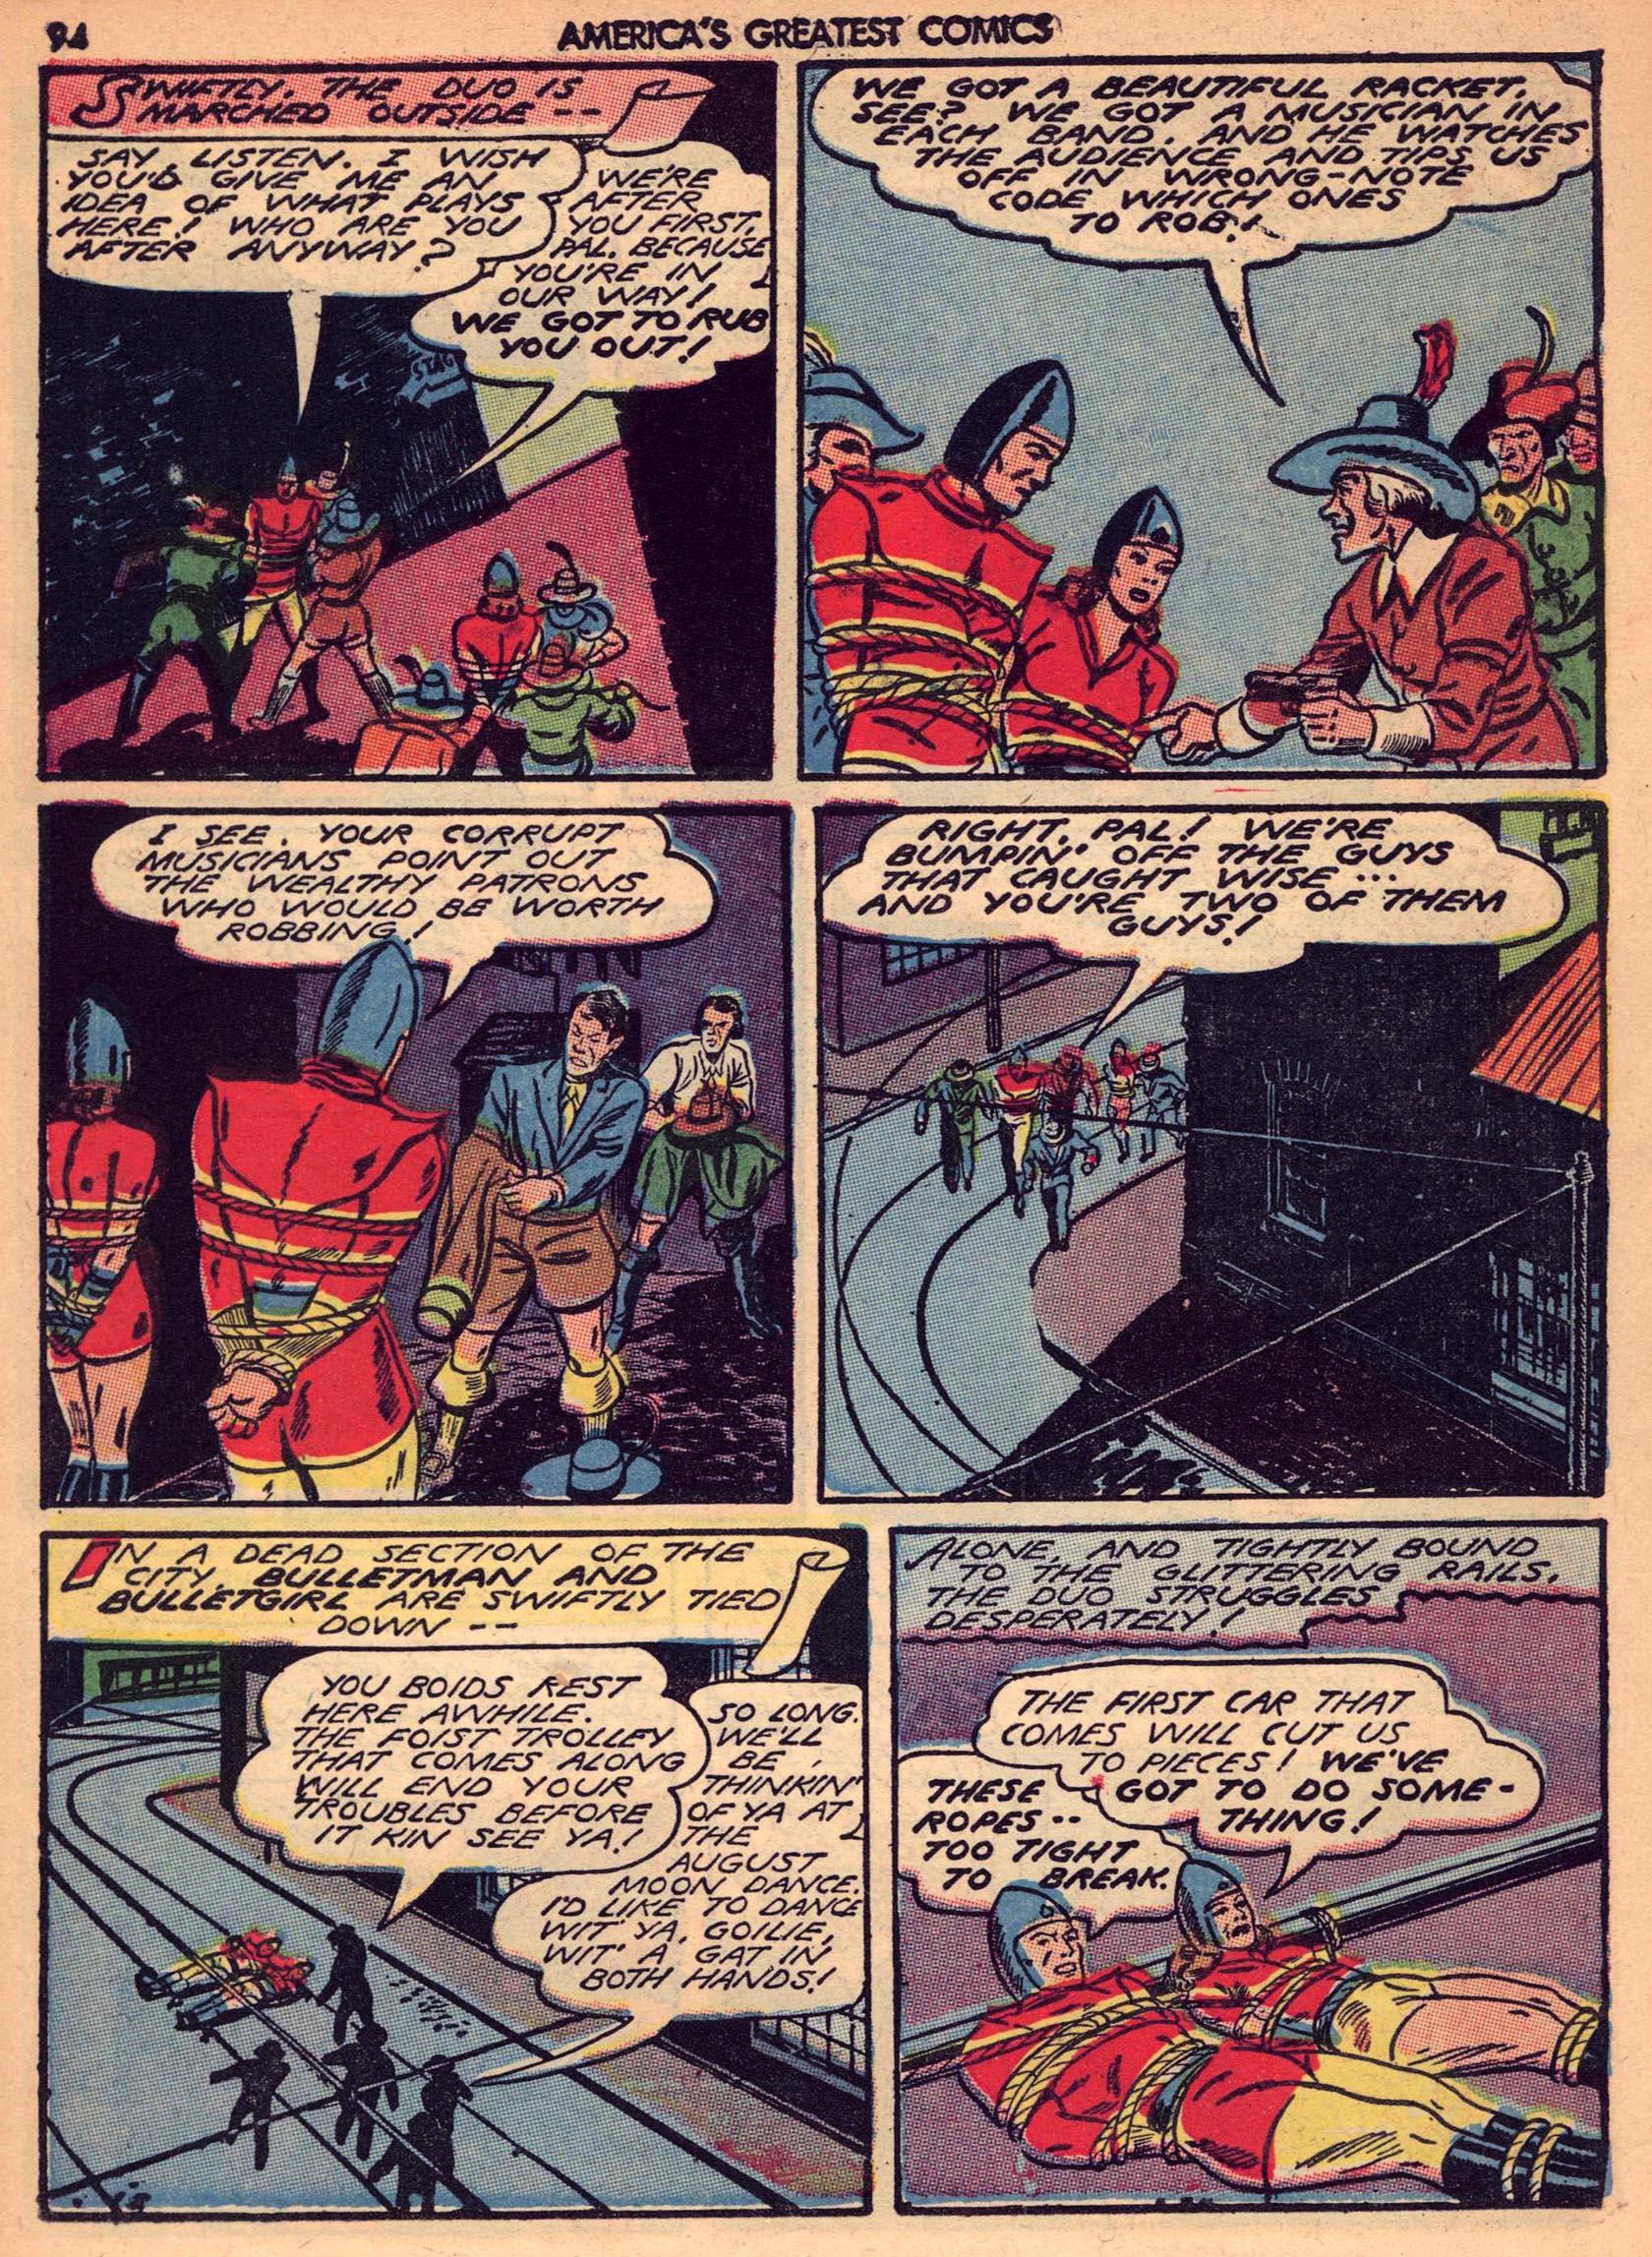 Read online America's Greatest Comics comic -  Issue #7 - 93